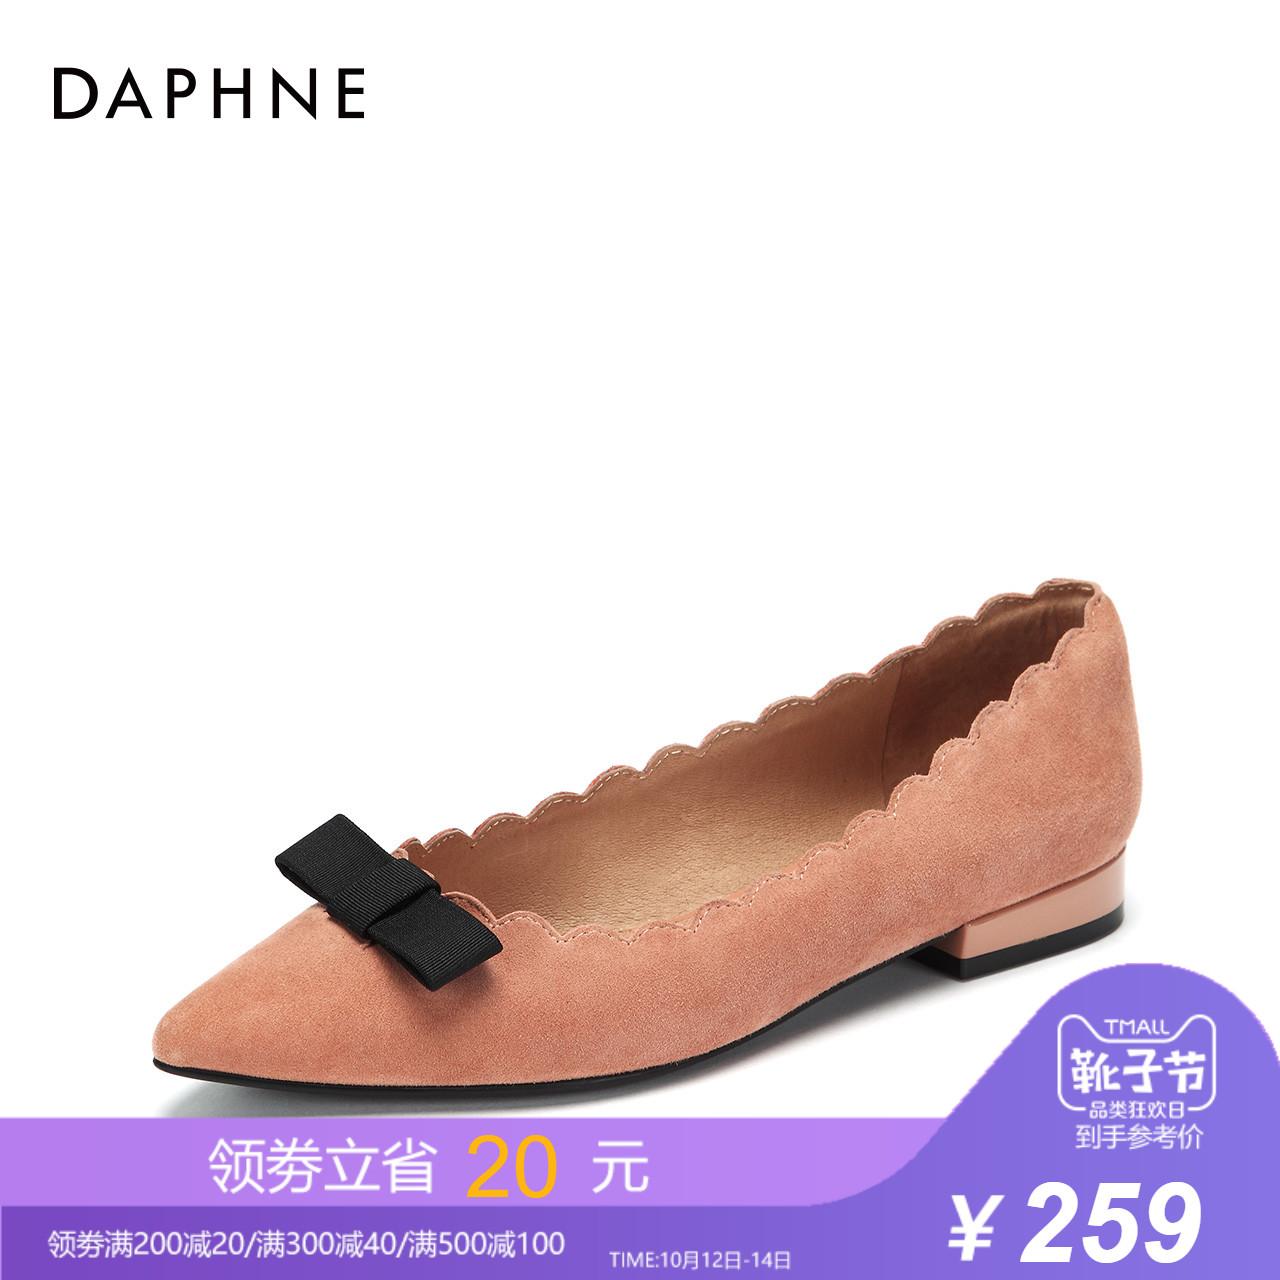 Daphne-达芙妮2018秋新款蝴蝶结平底鞋休闲时尚羊皮单鞋女